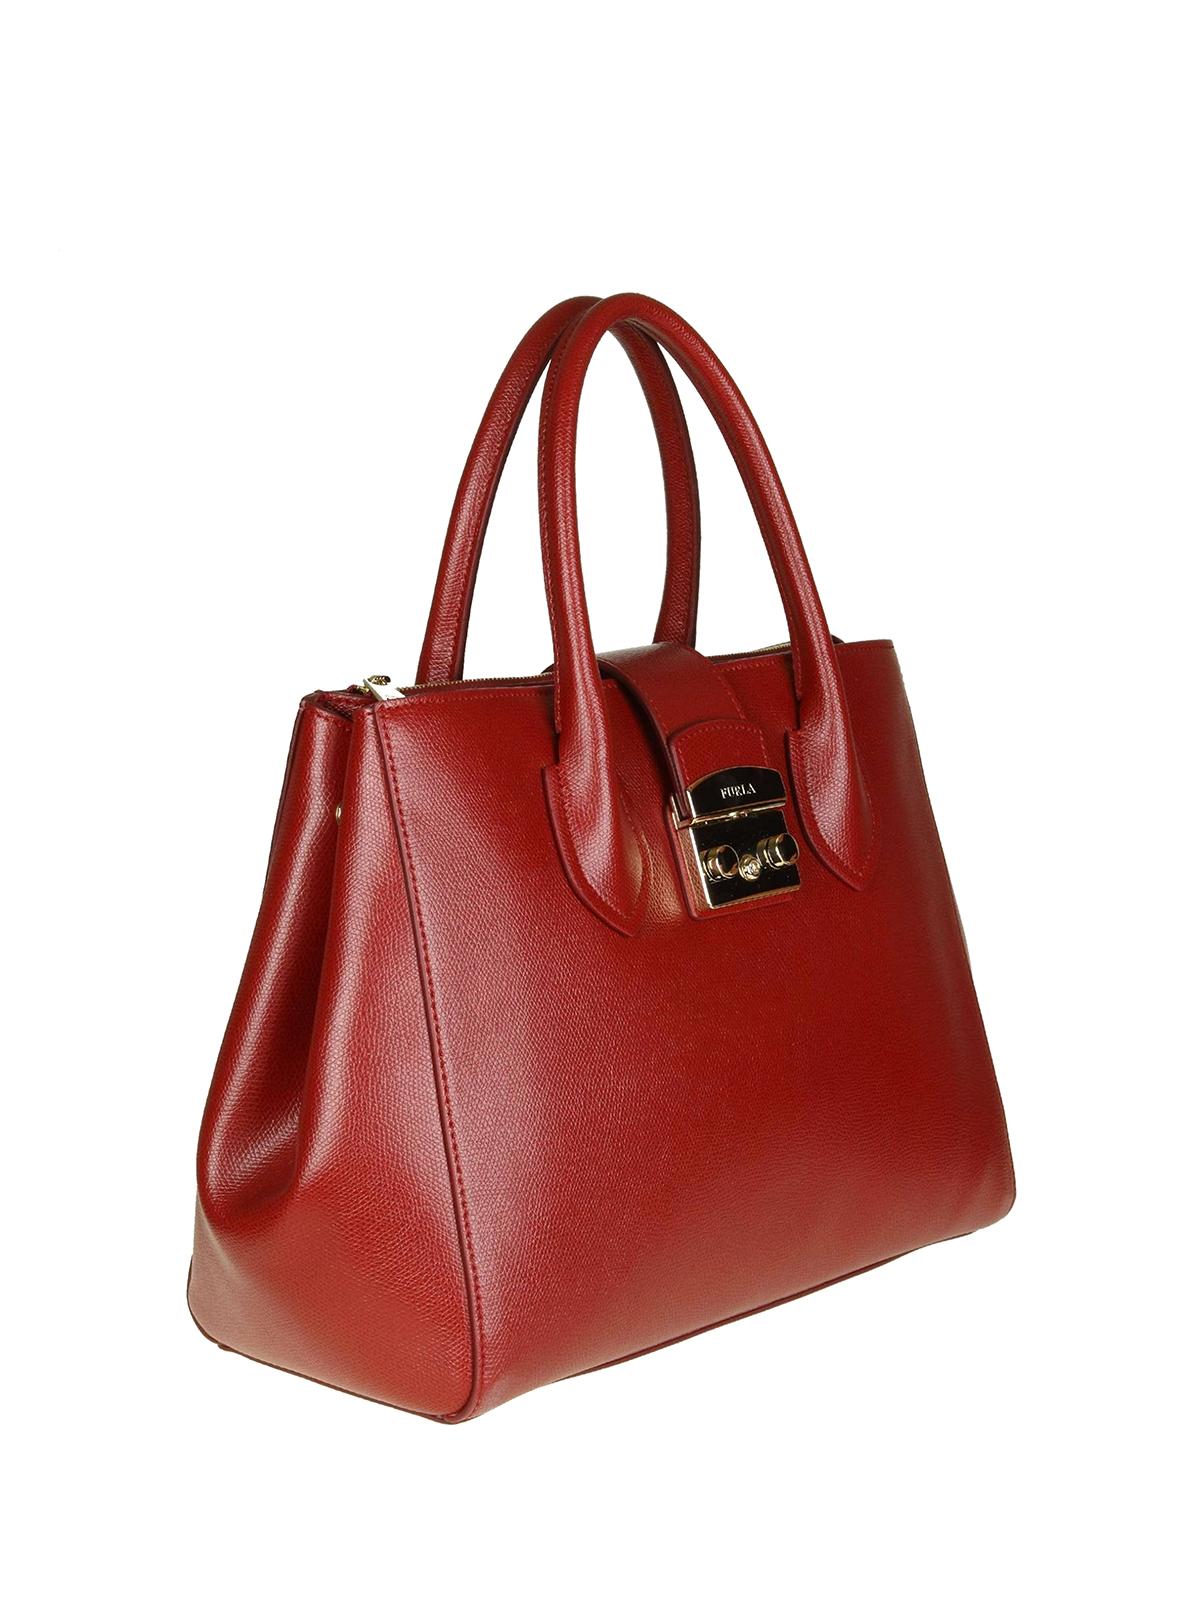 654923e55c61 Furla Metropolis Cherry Red Leather Medium Handbag Totes Bags